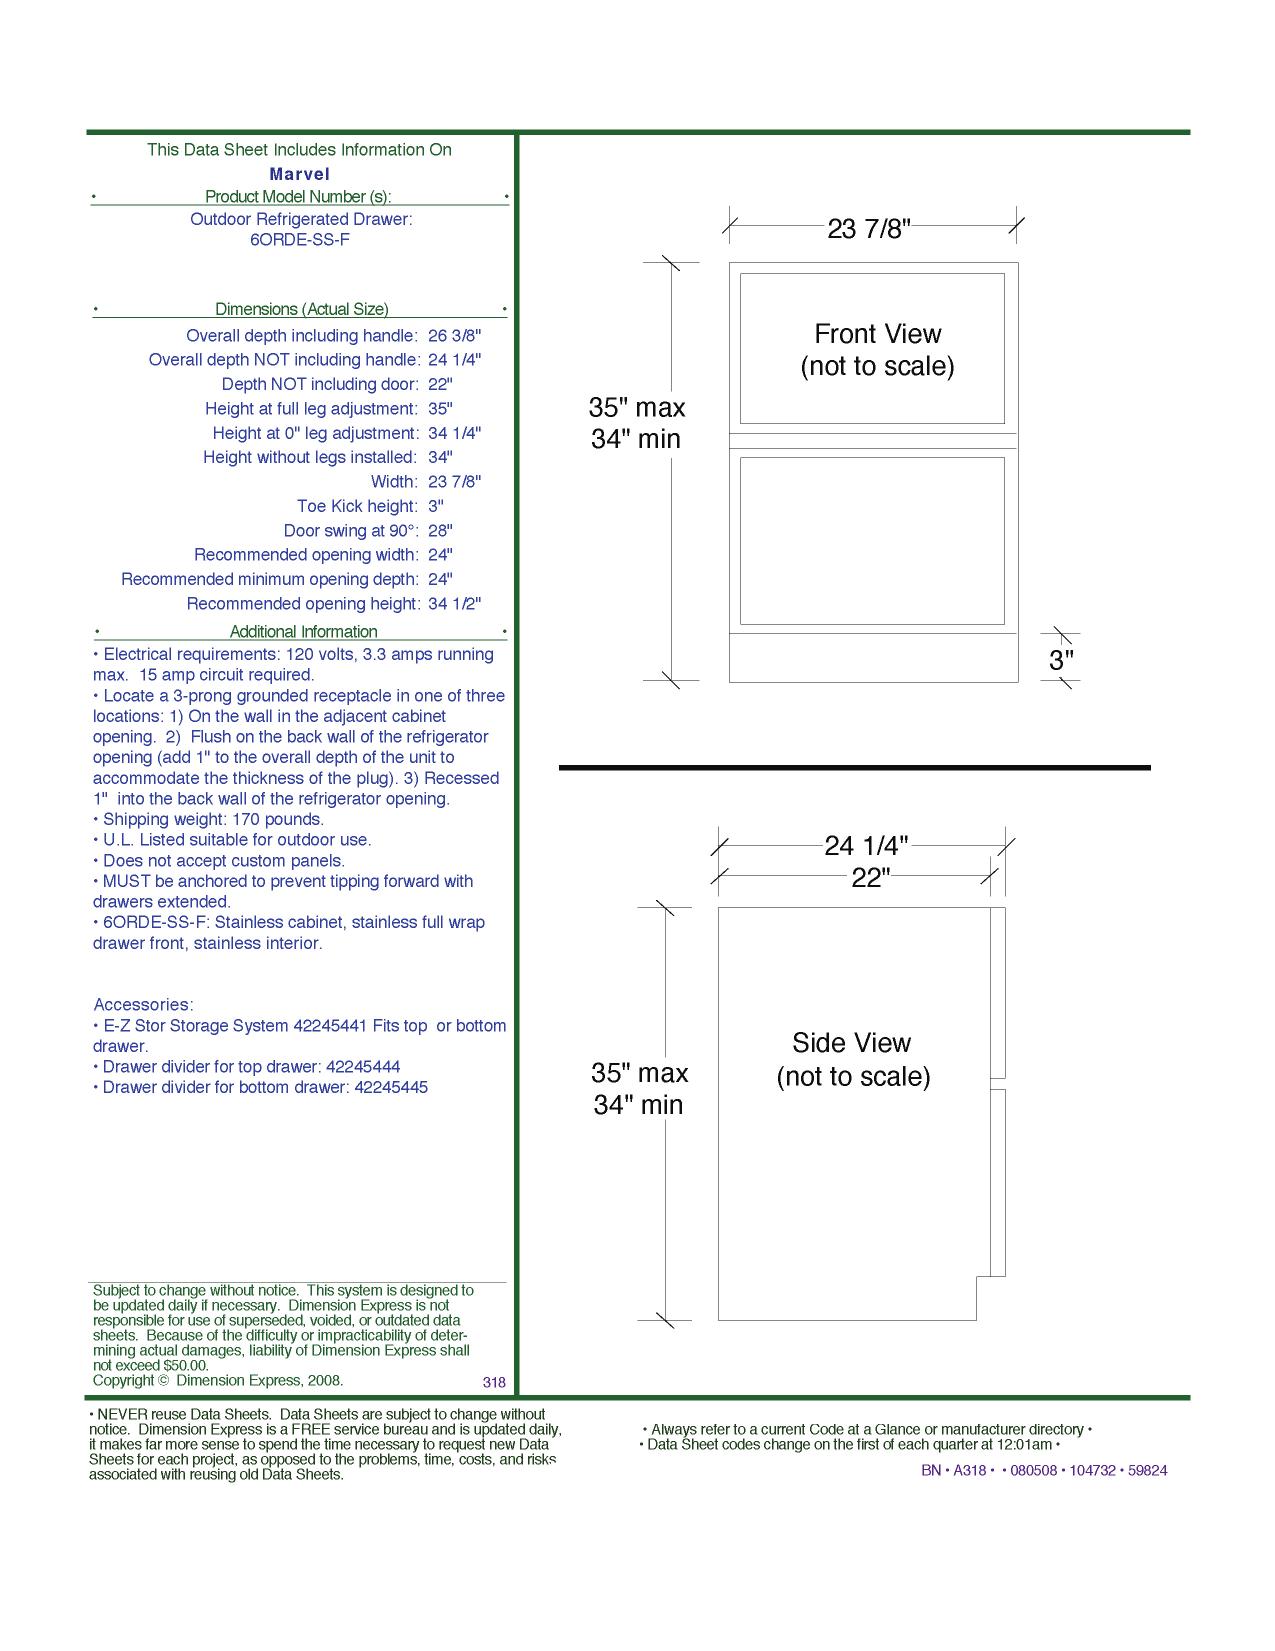 pdf for Marvel Refrigerator 6ORDE-SS-F manual